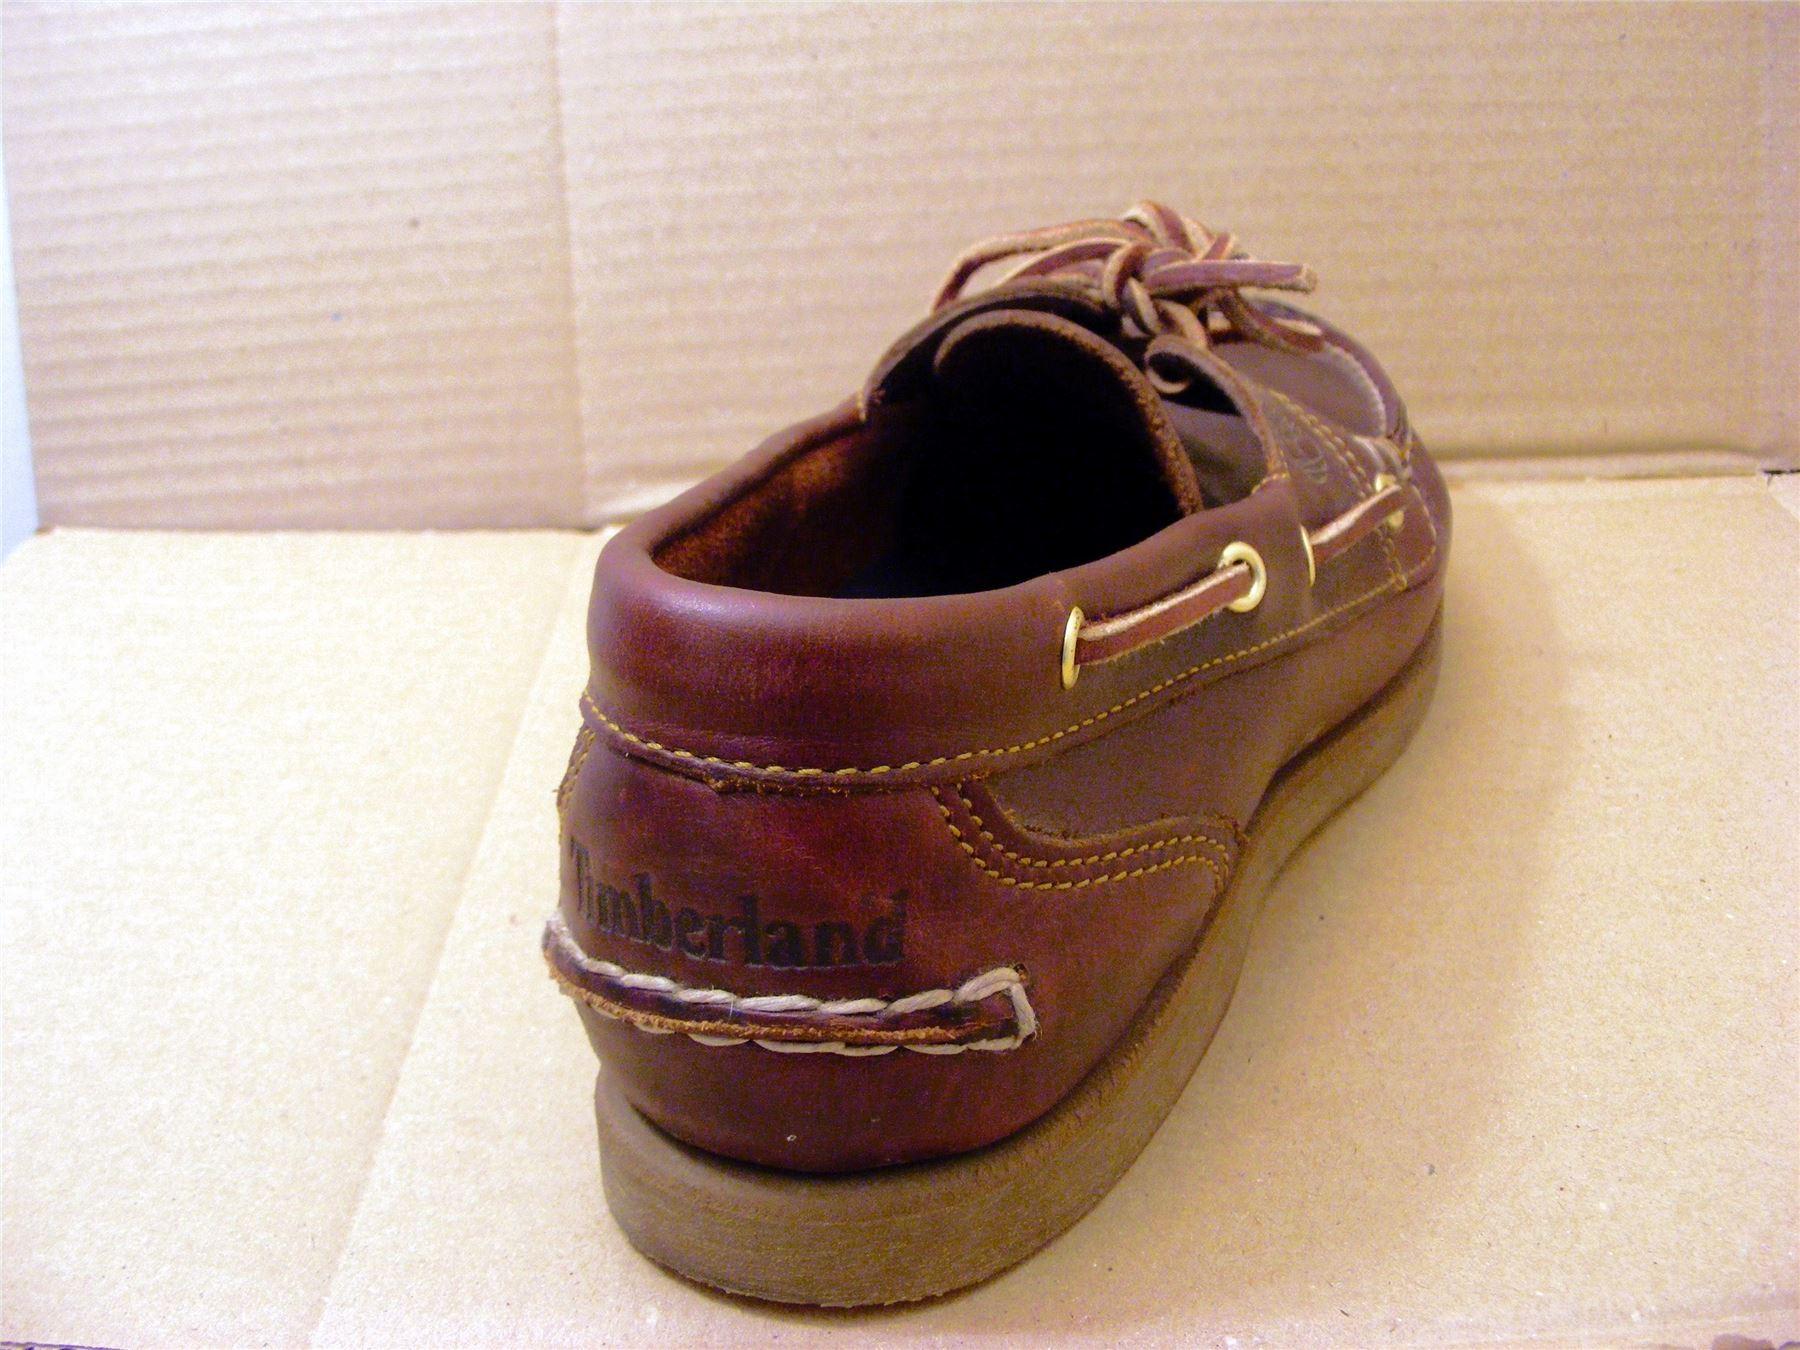 uk marrón 5 tamaño 5 Zapatos Timberland para Classic 2 náuticos ojos Rootbeer de mujer q7OxqzwHS